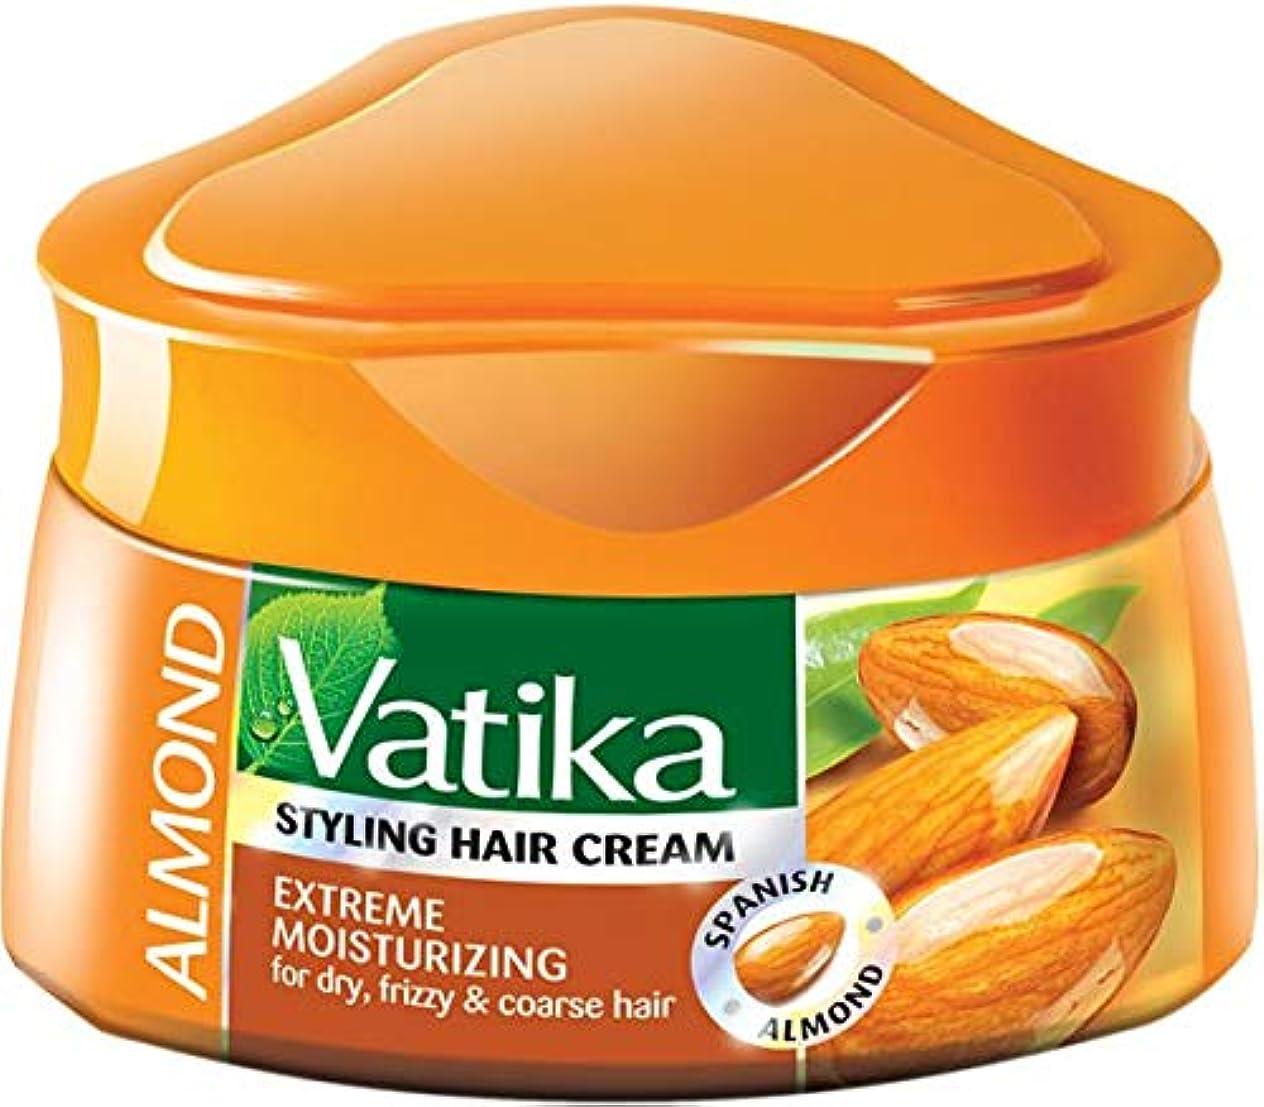 Dabur Vatika Natural Styling Hair Cream 140 ml (Extreme Moisturizing (Almond))